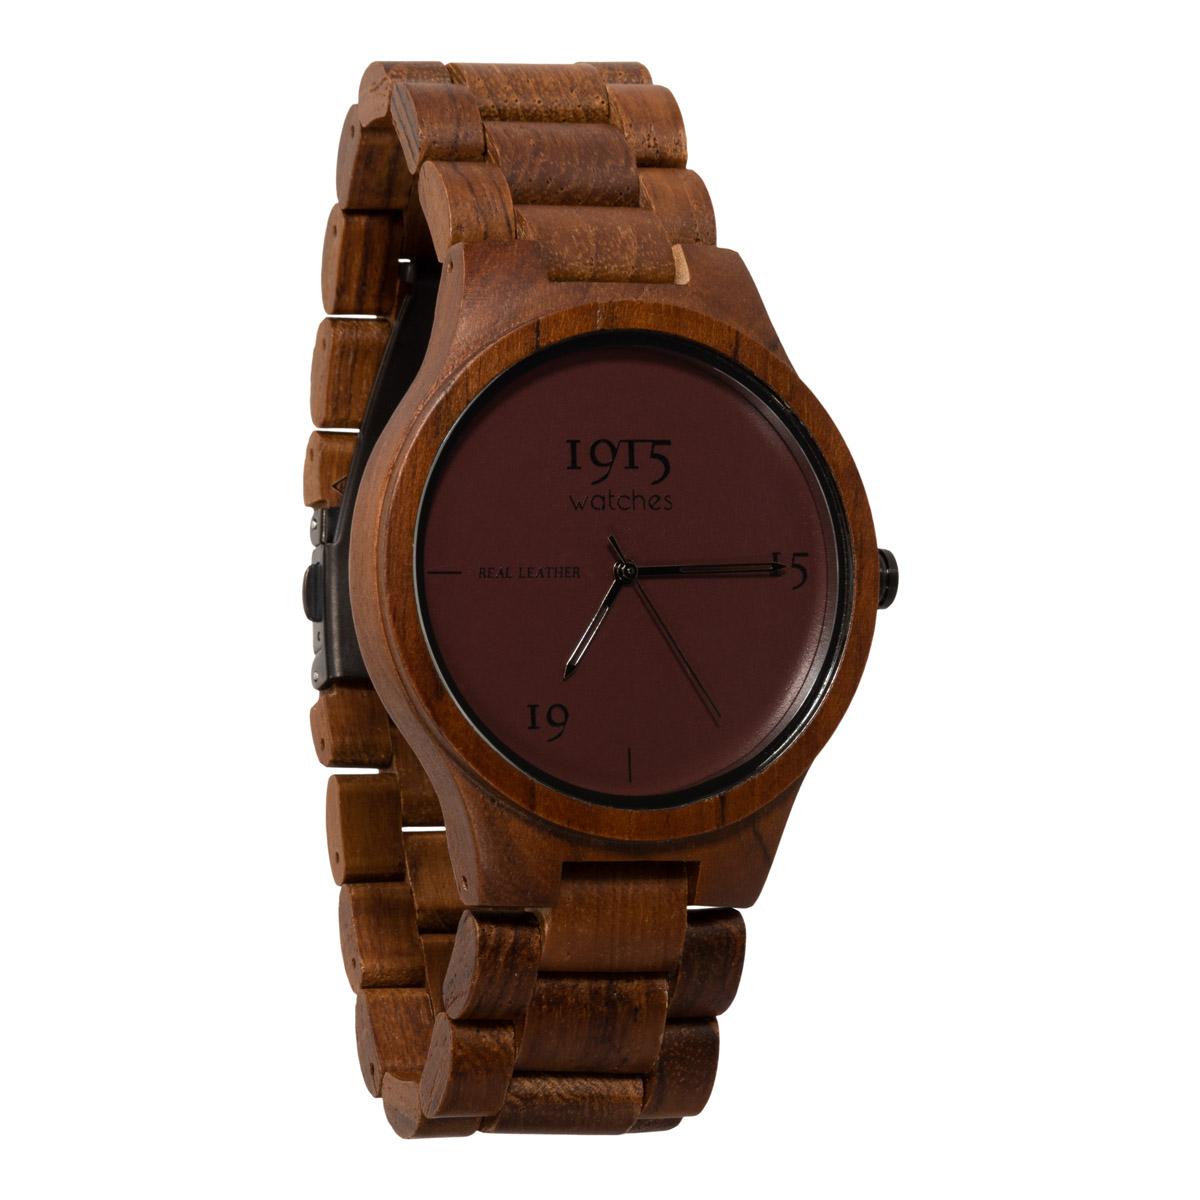 1915 watches - 1915 watch men real leather bordeaux houten horloge